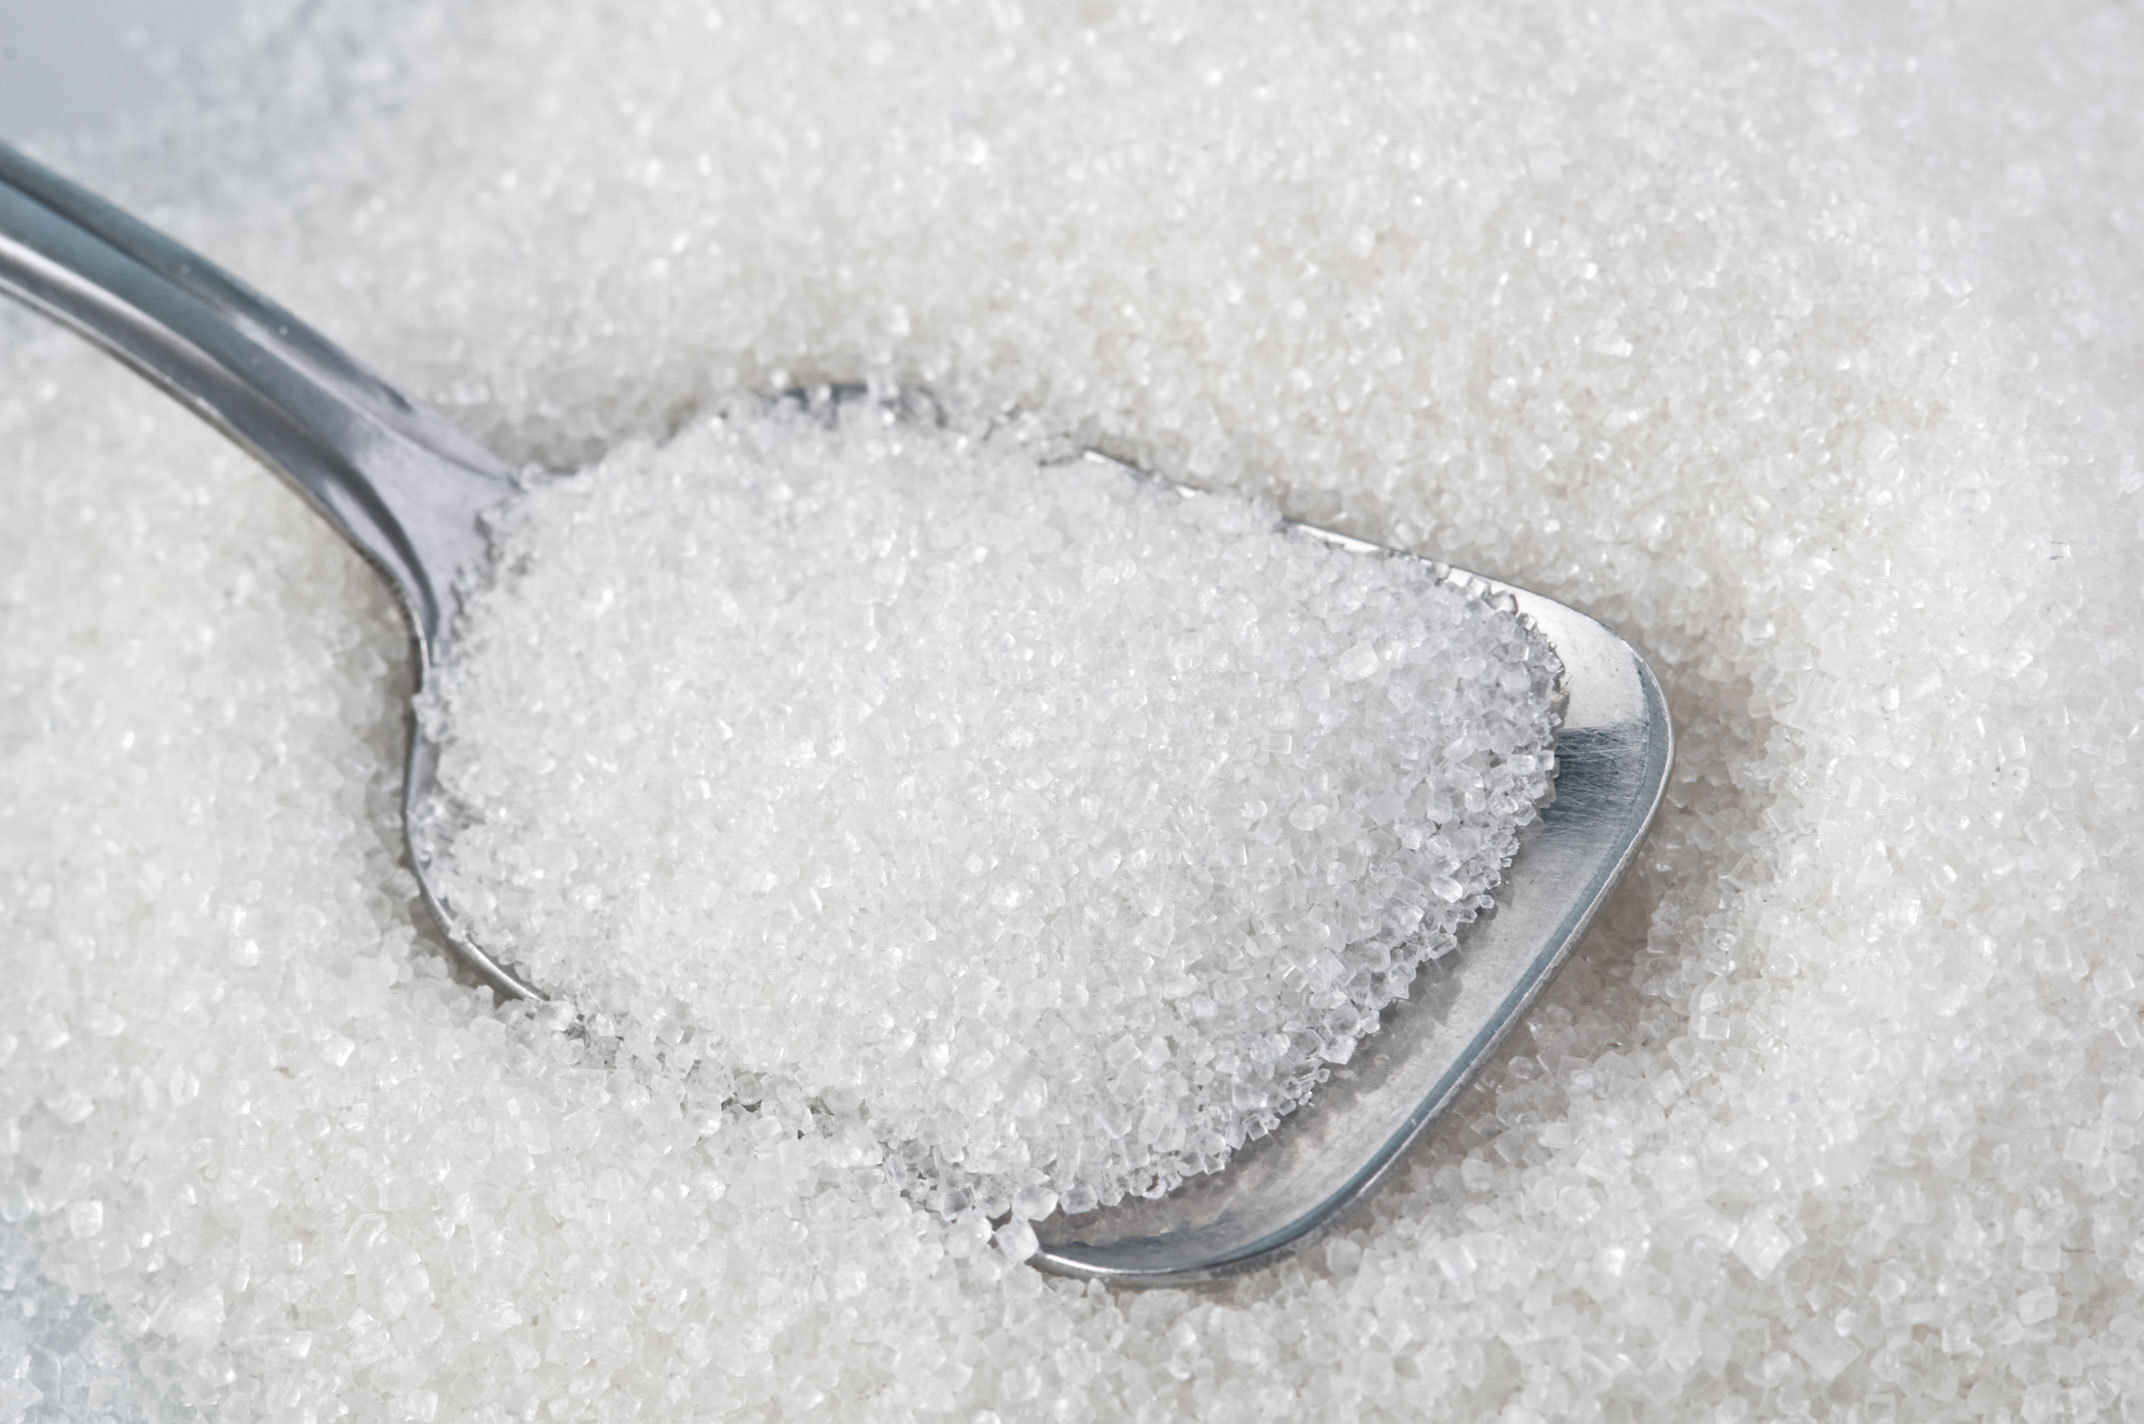 Новгородстат: За 2014 год сахар стал дороже на 32%